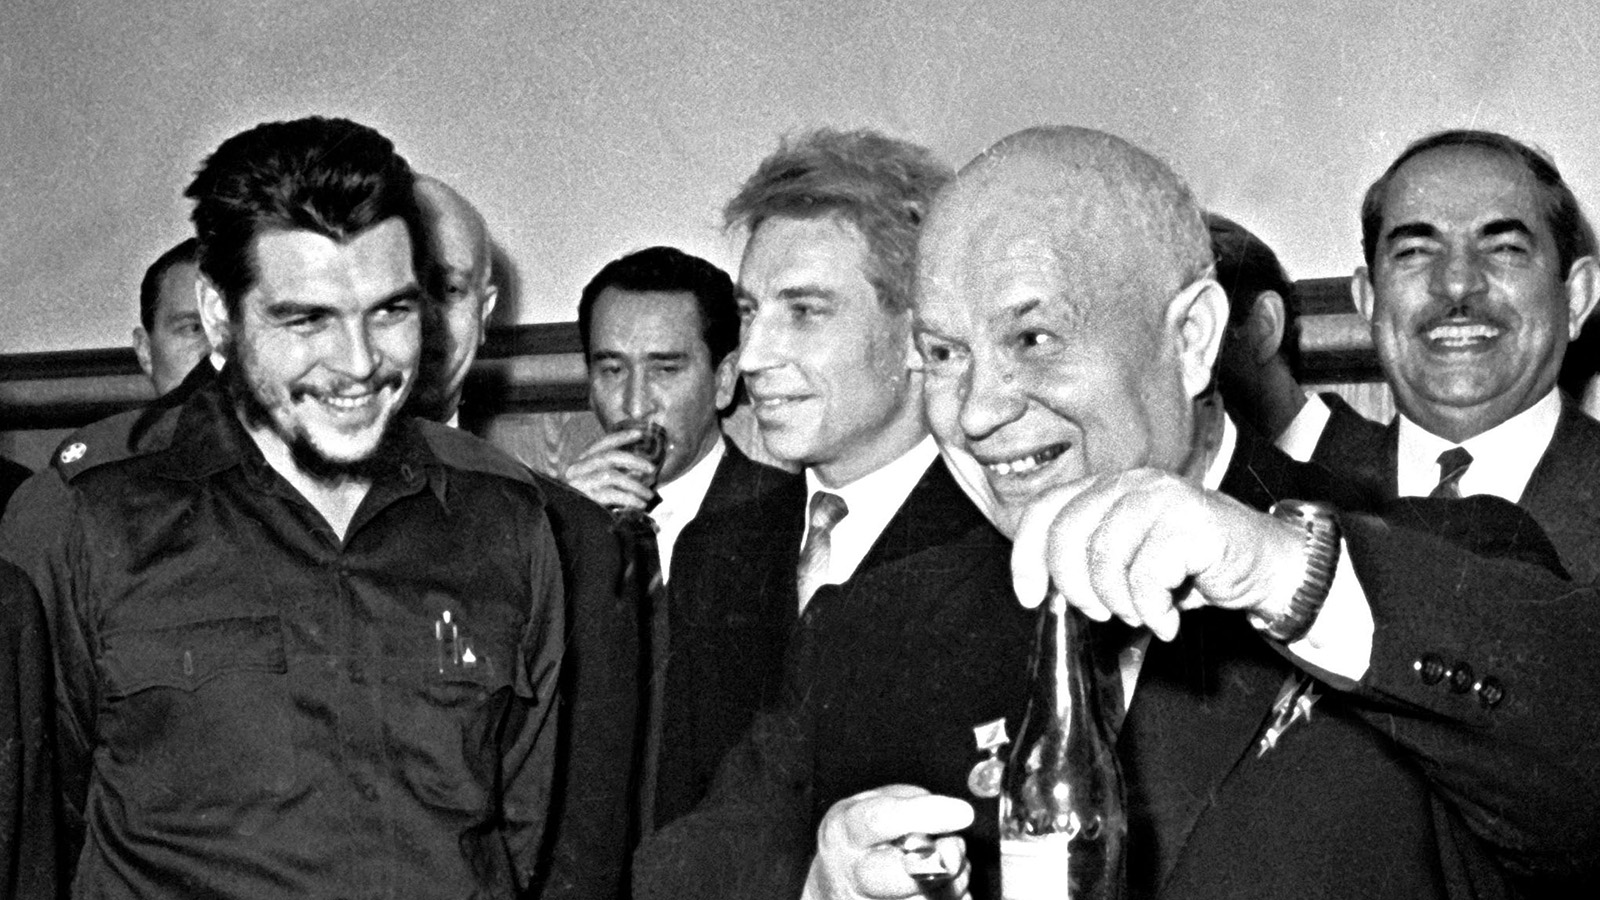 1962 год, Москва. Эрнесто Чегевара на приеме у Никиты Хрущева